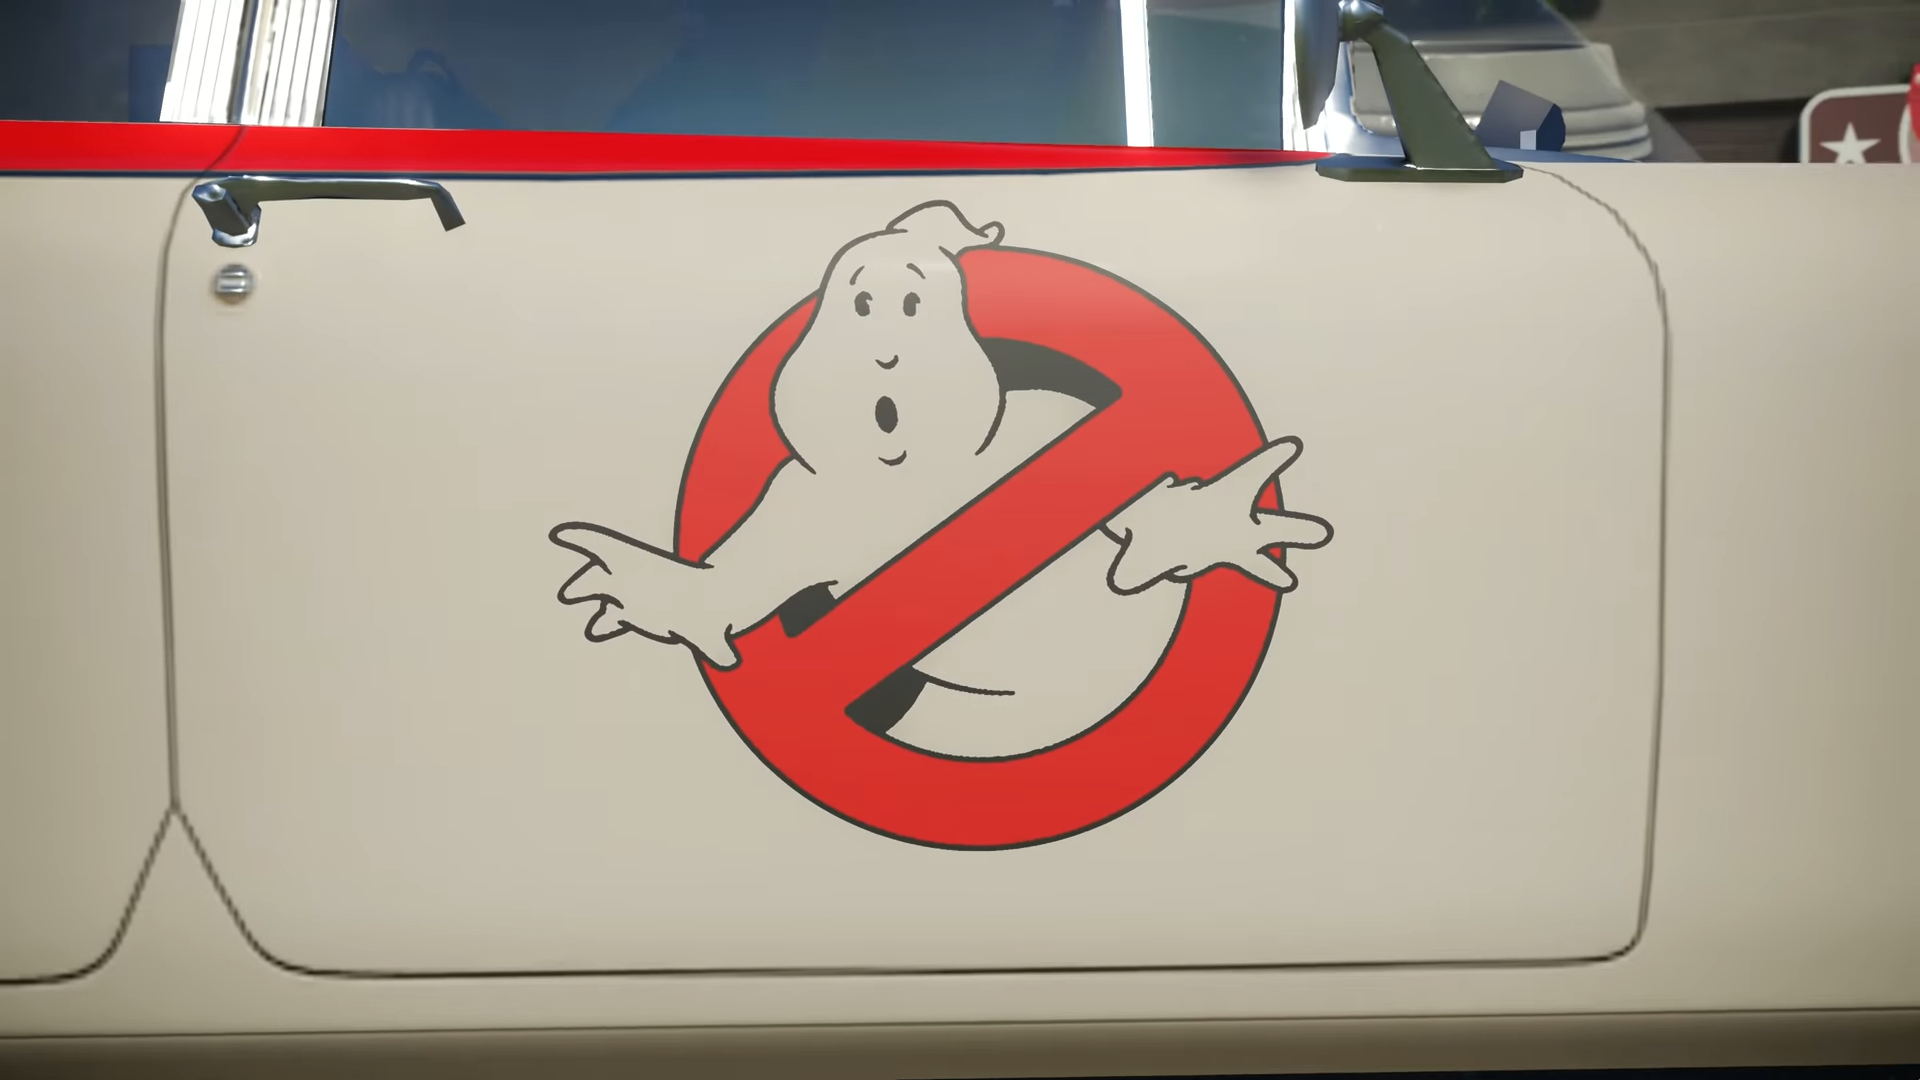 Planet Coaster получит DLC по мотивам «Охотников за привидениями»